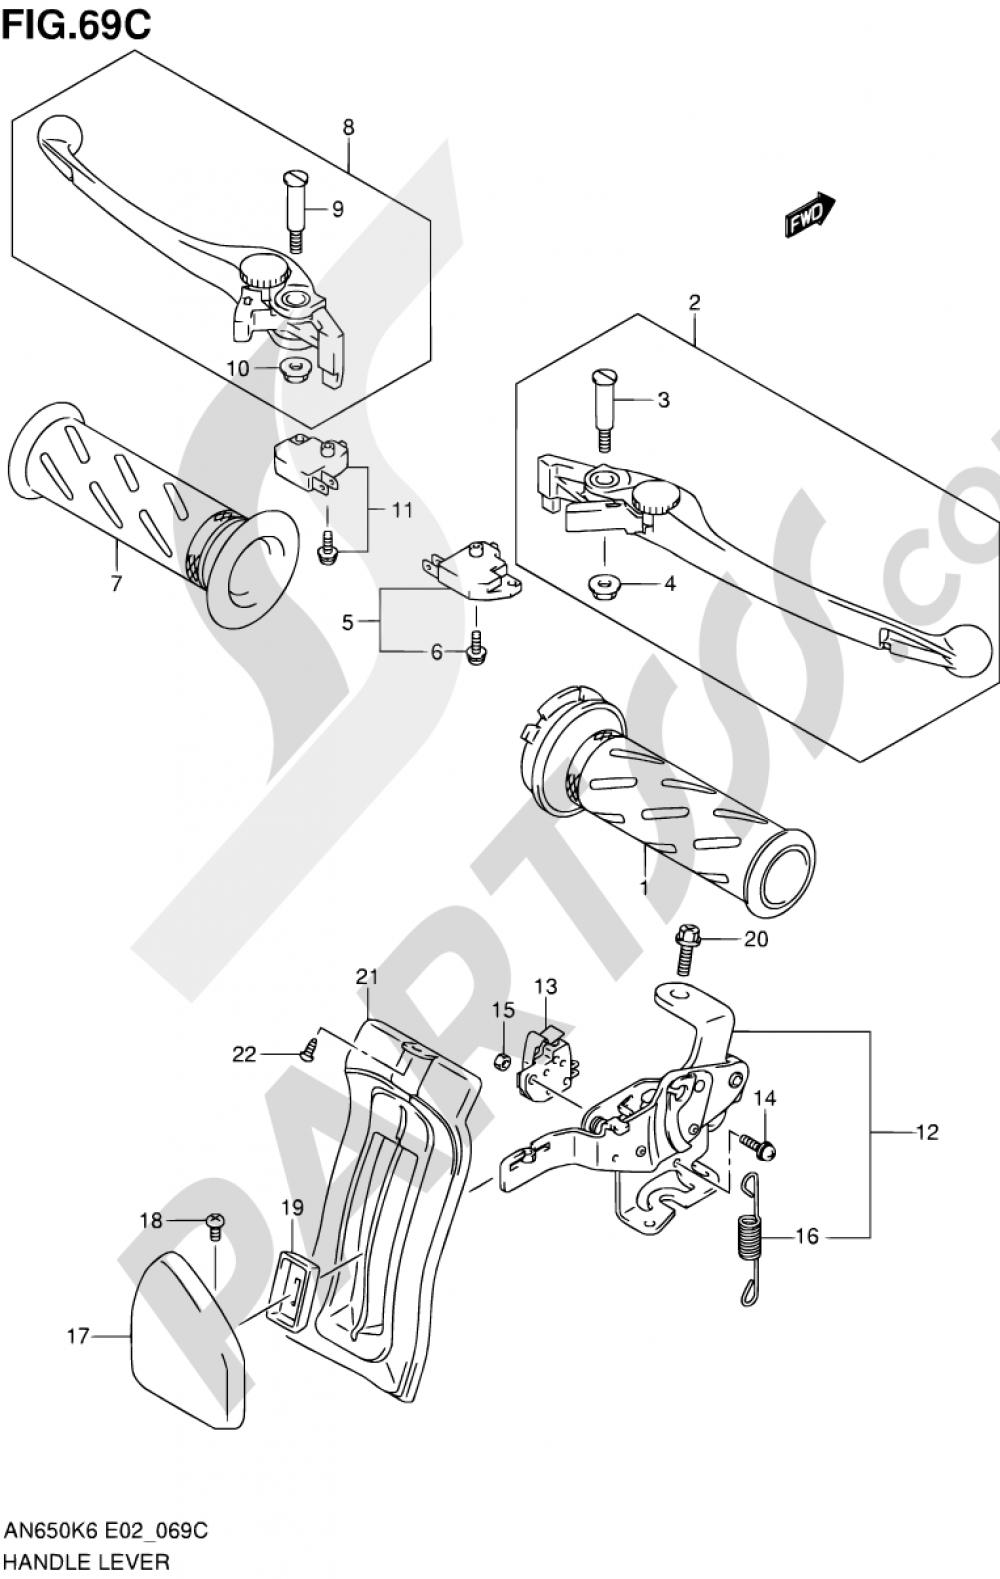 69C - HANDLE LEVER (AN650AK9/AL0 E24,E51,P37) Suzuki BURGMAN AN650 2009